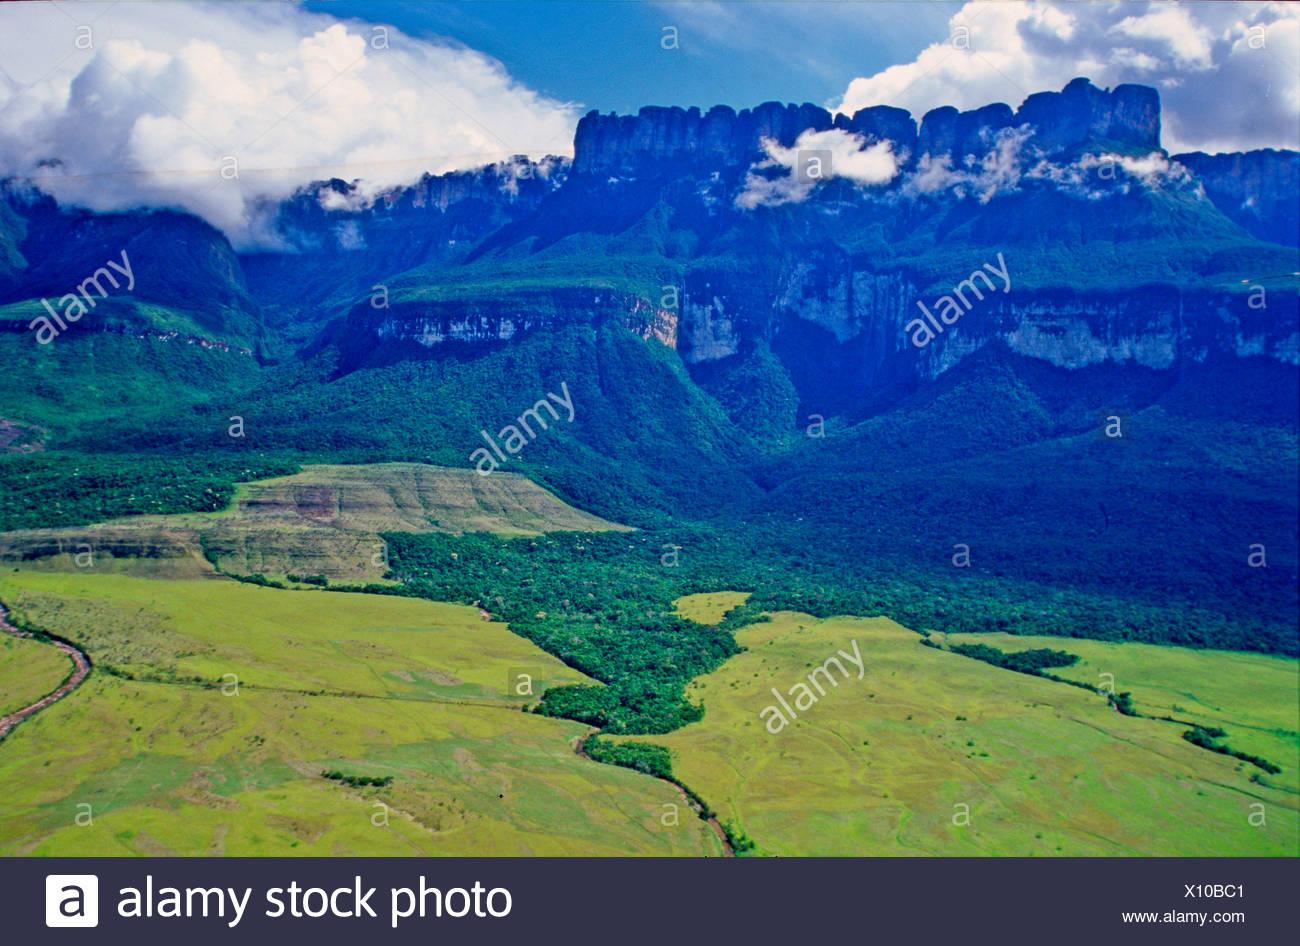 Venezuela Sudamerika Auyan Tepui Tabelle Berge Berg Landschaft